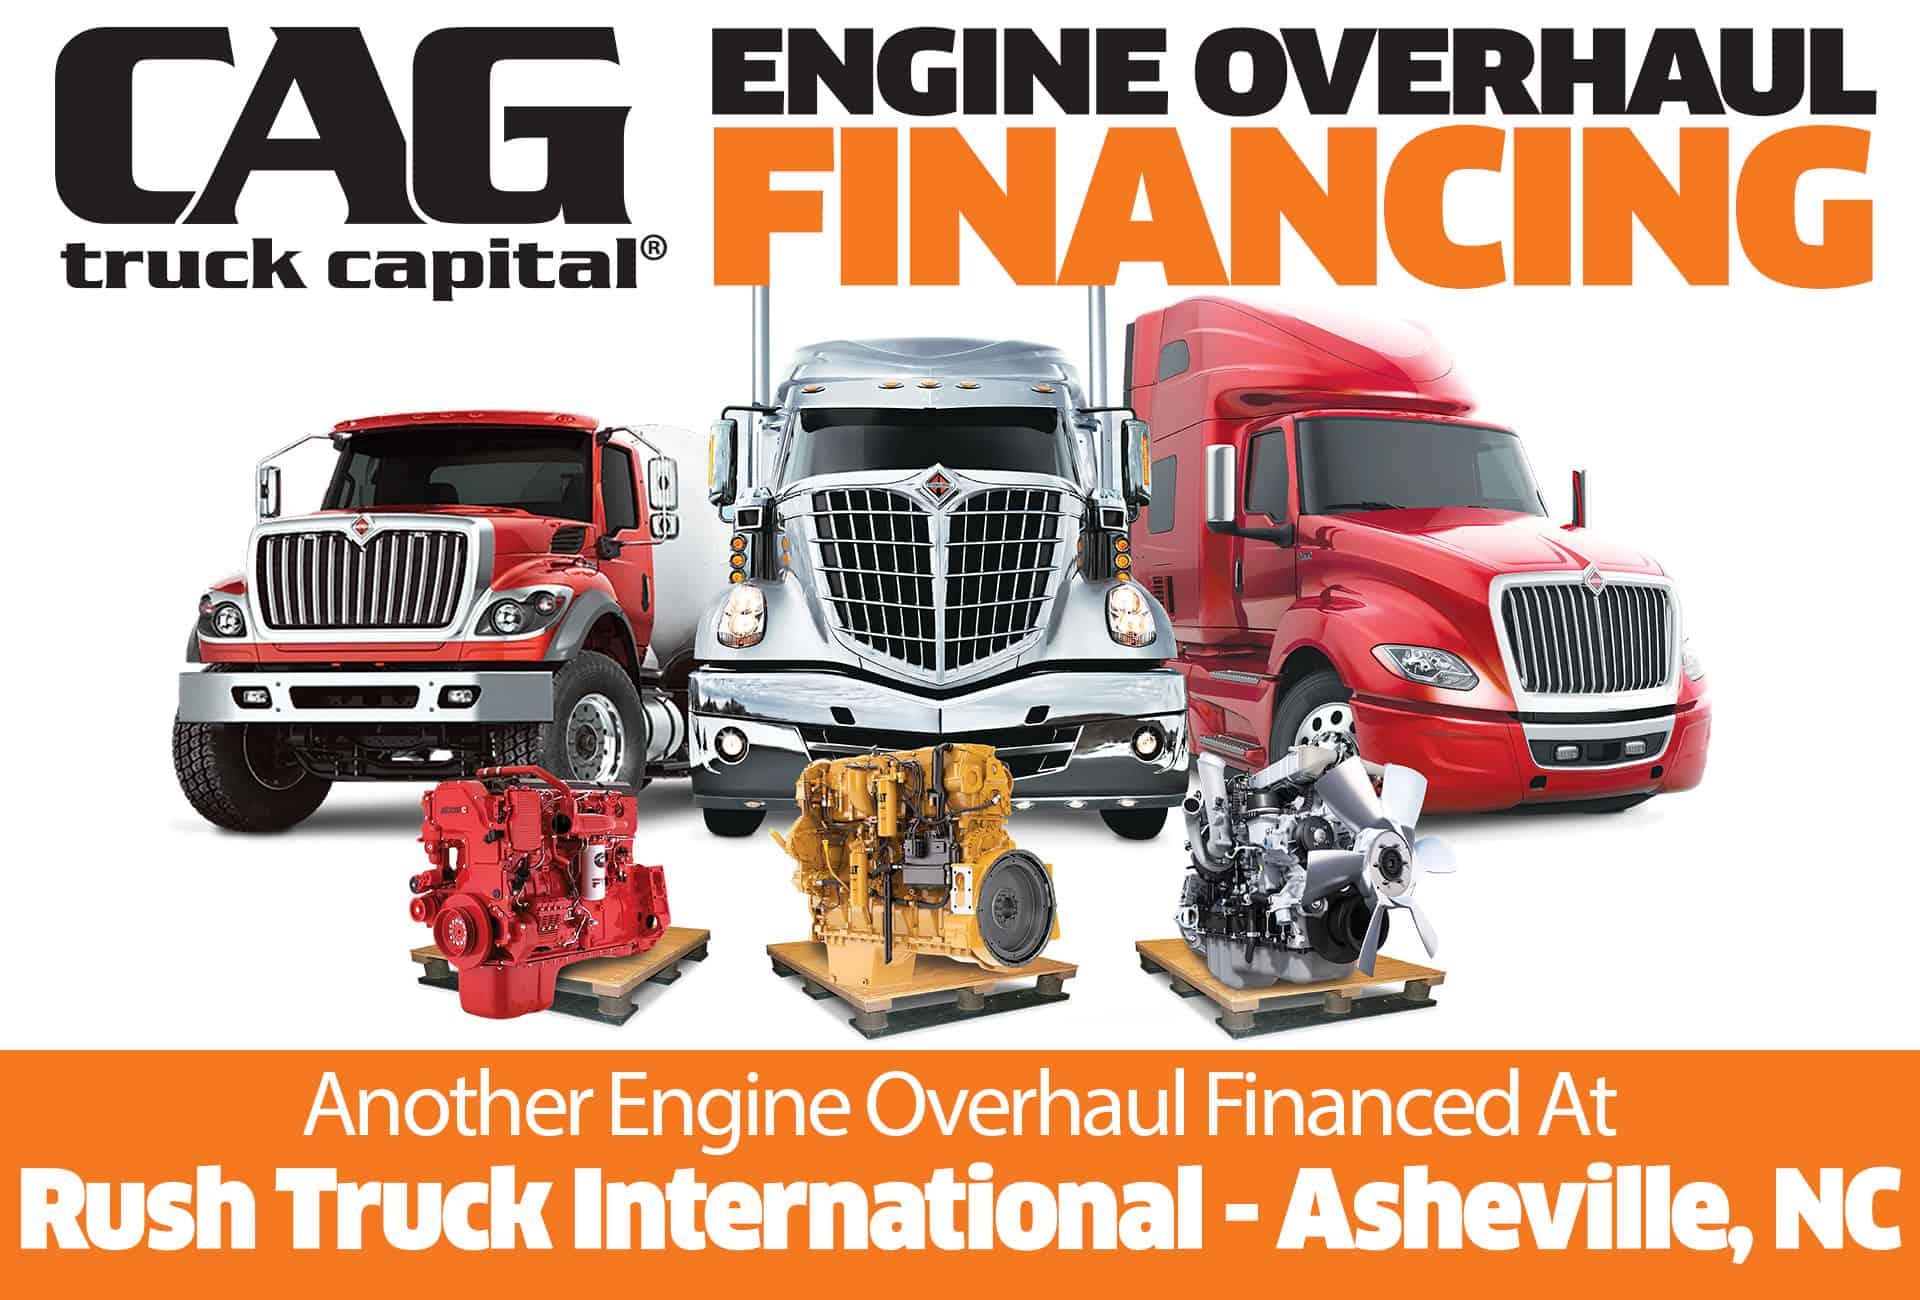 Rush International Engine Overhaul Financing Asheville NC